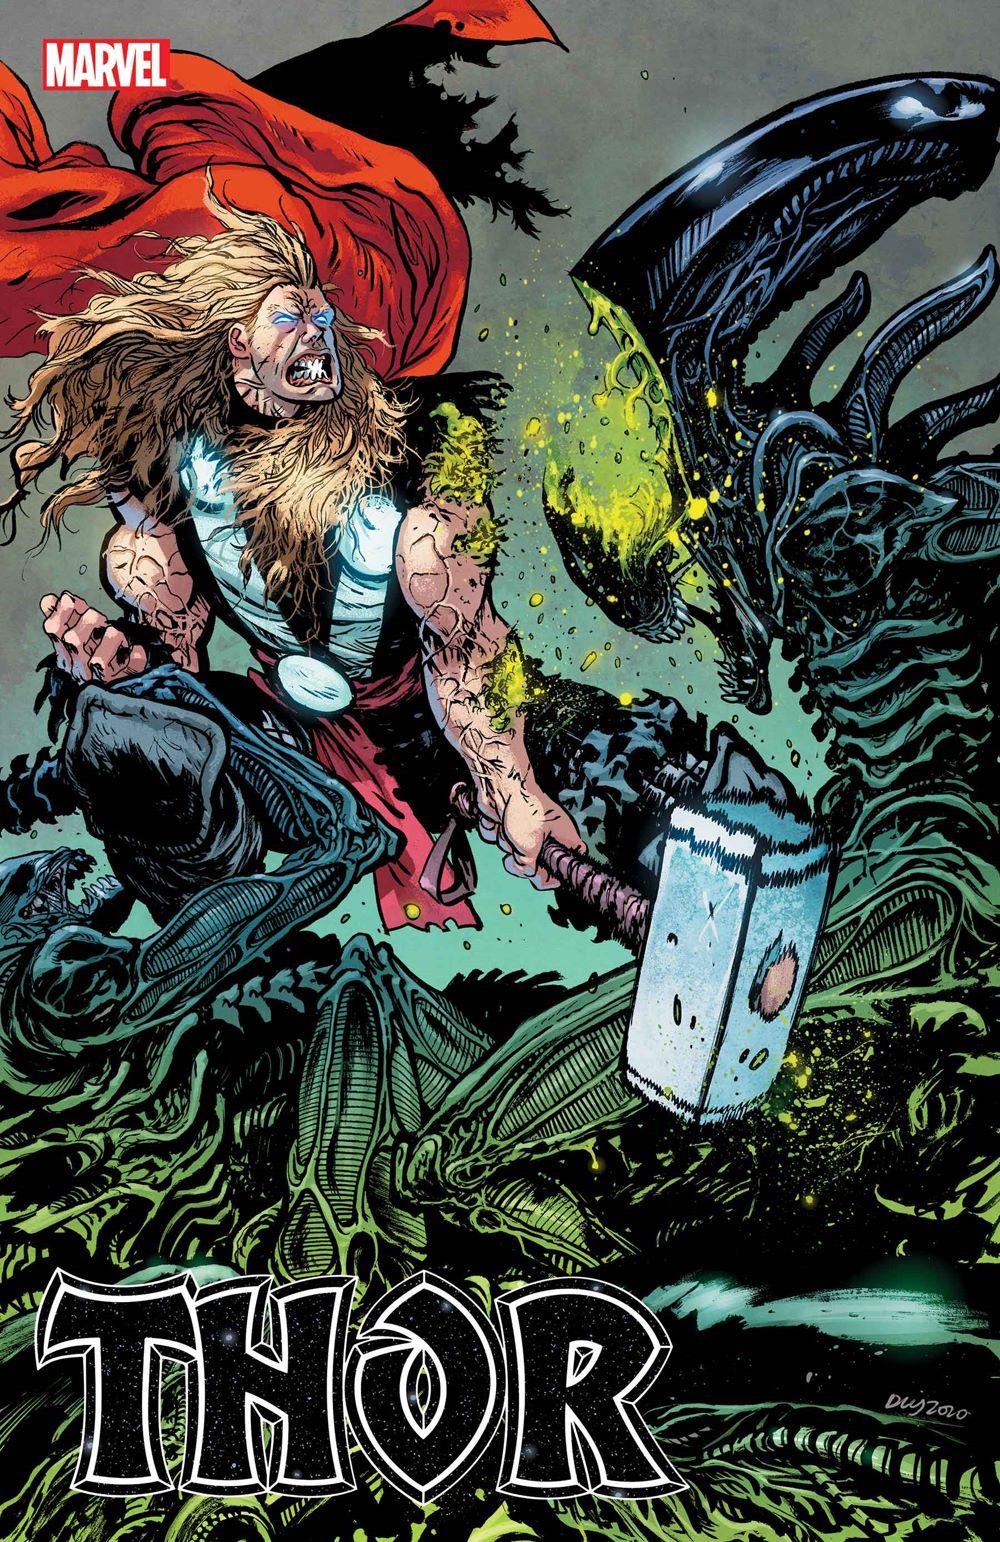 THOR2020011_Alien_var Marvel Comics January 2021 Solicitations